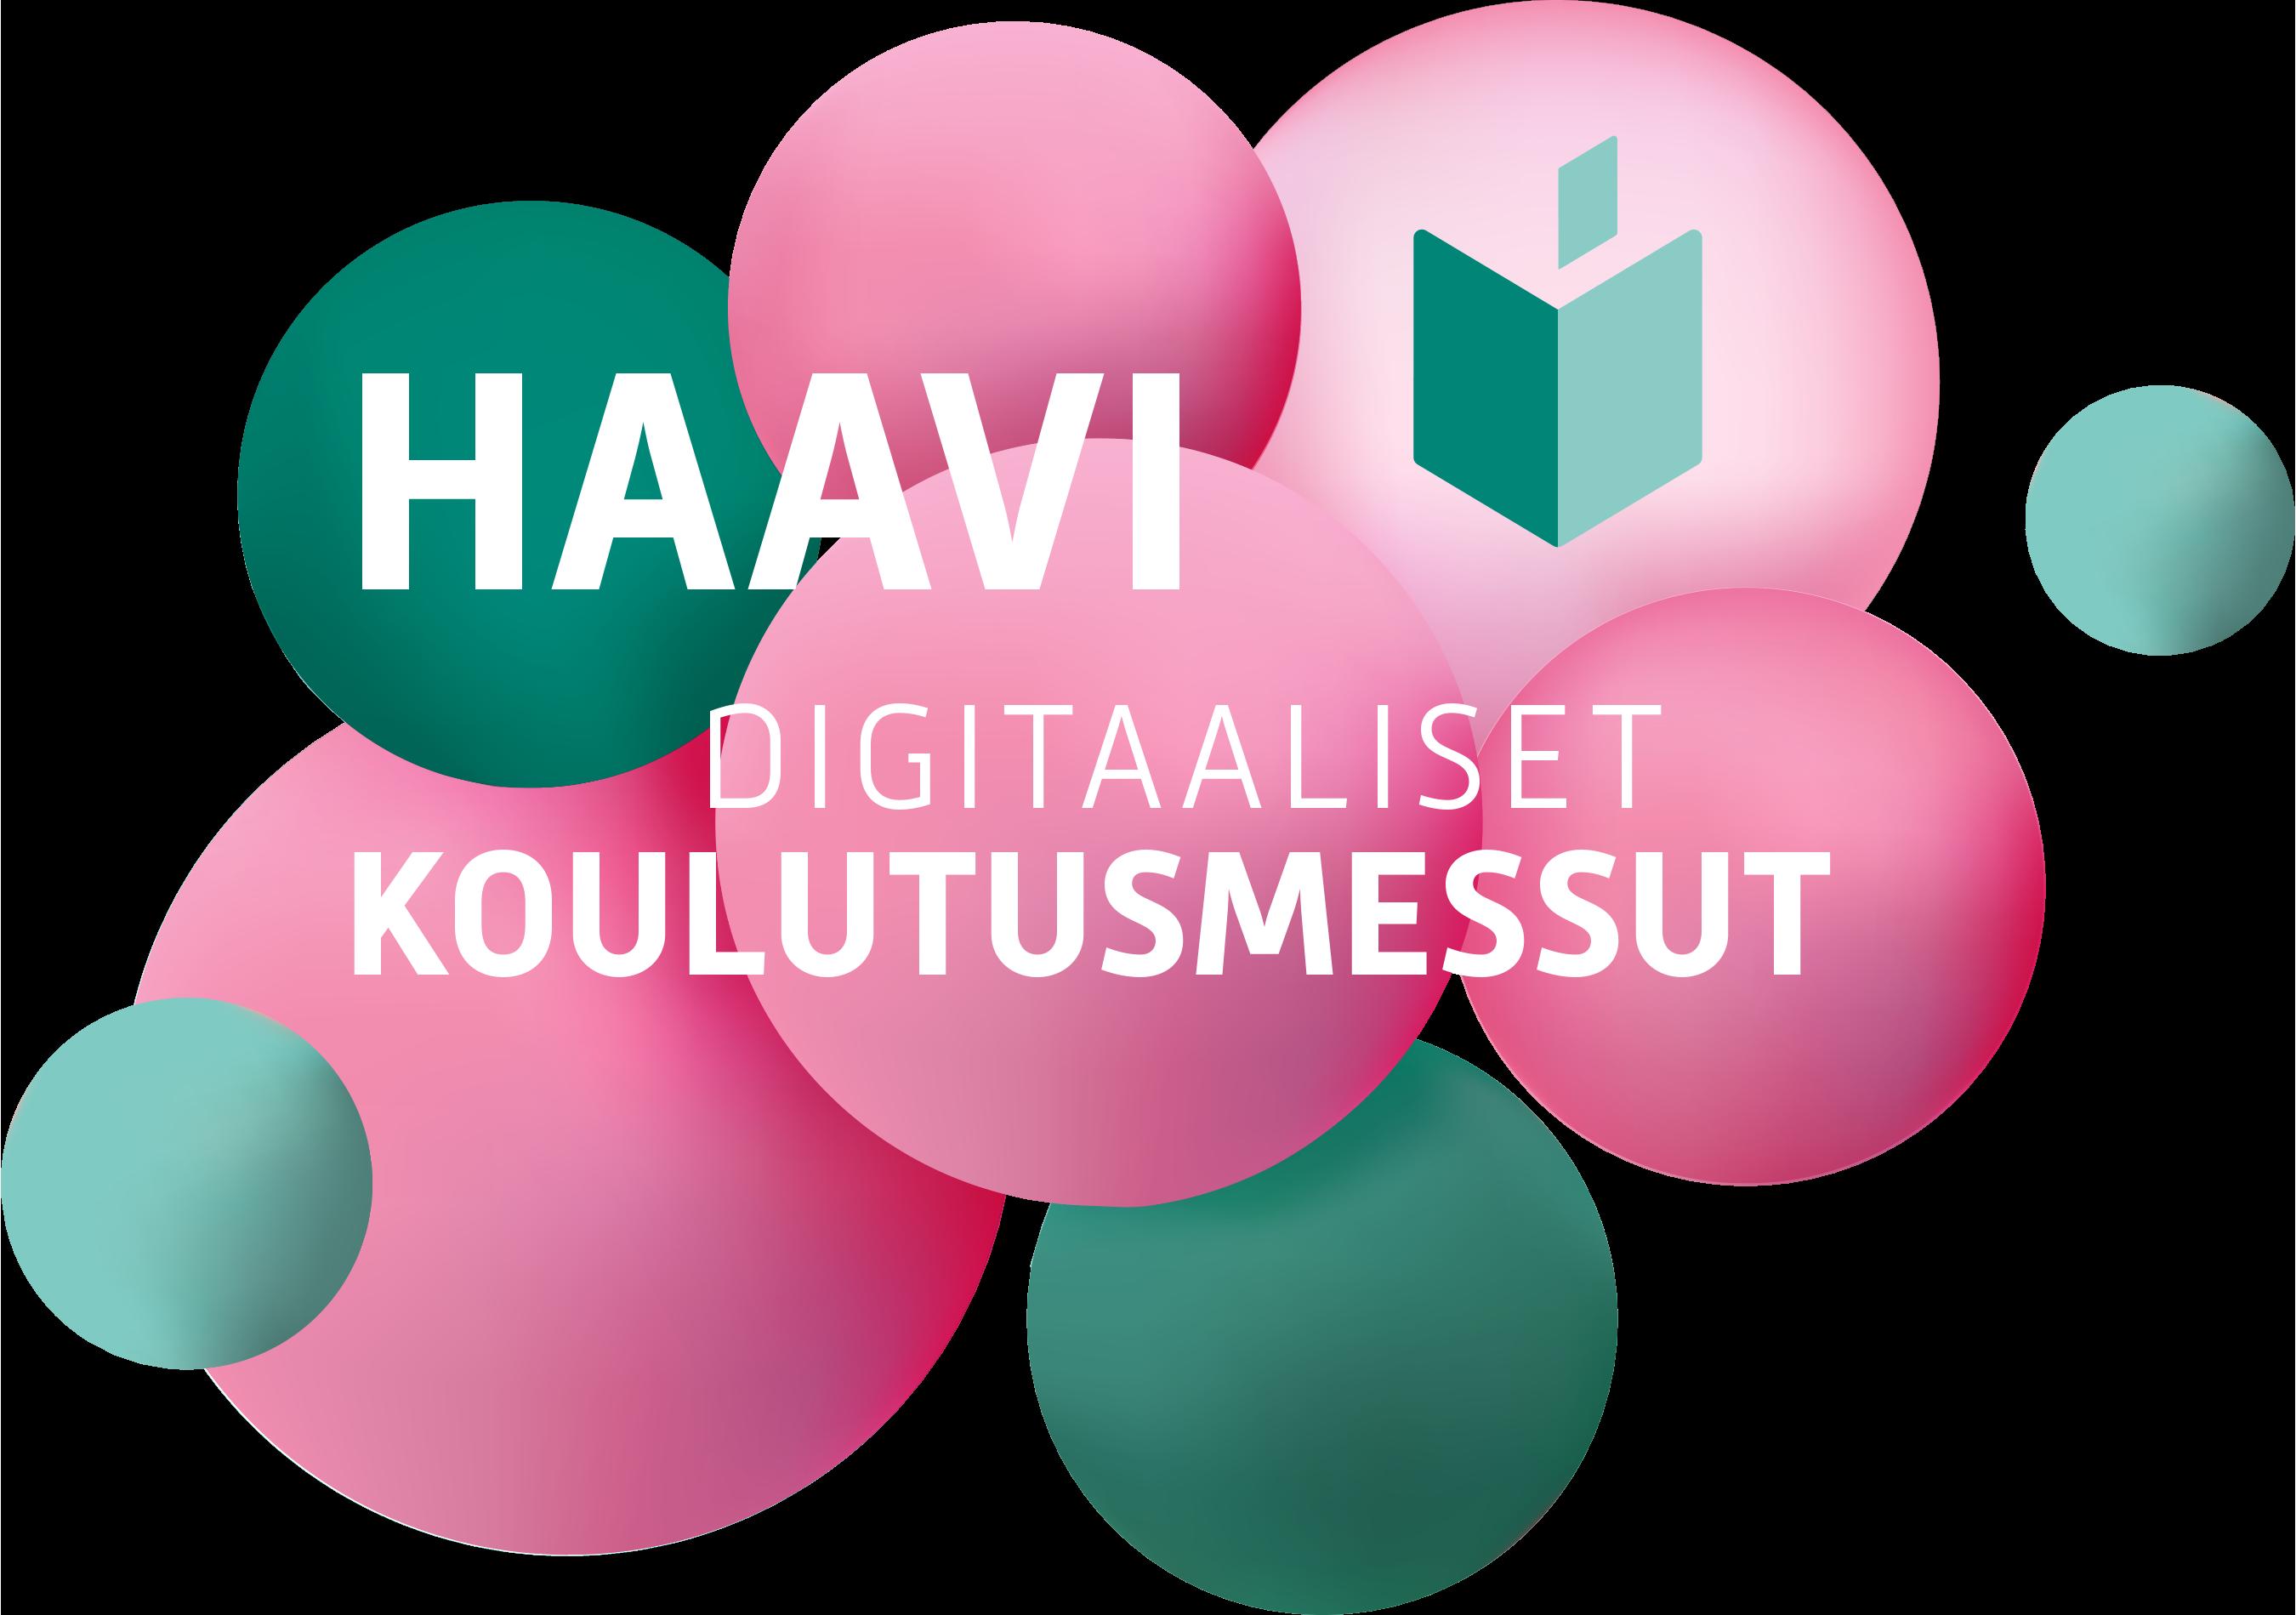 Haavi_pallot_logo_no_background-1